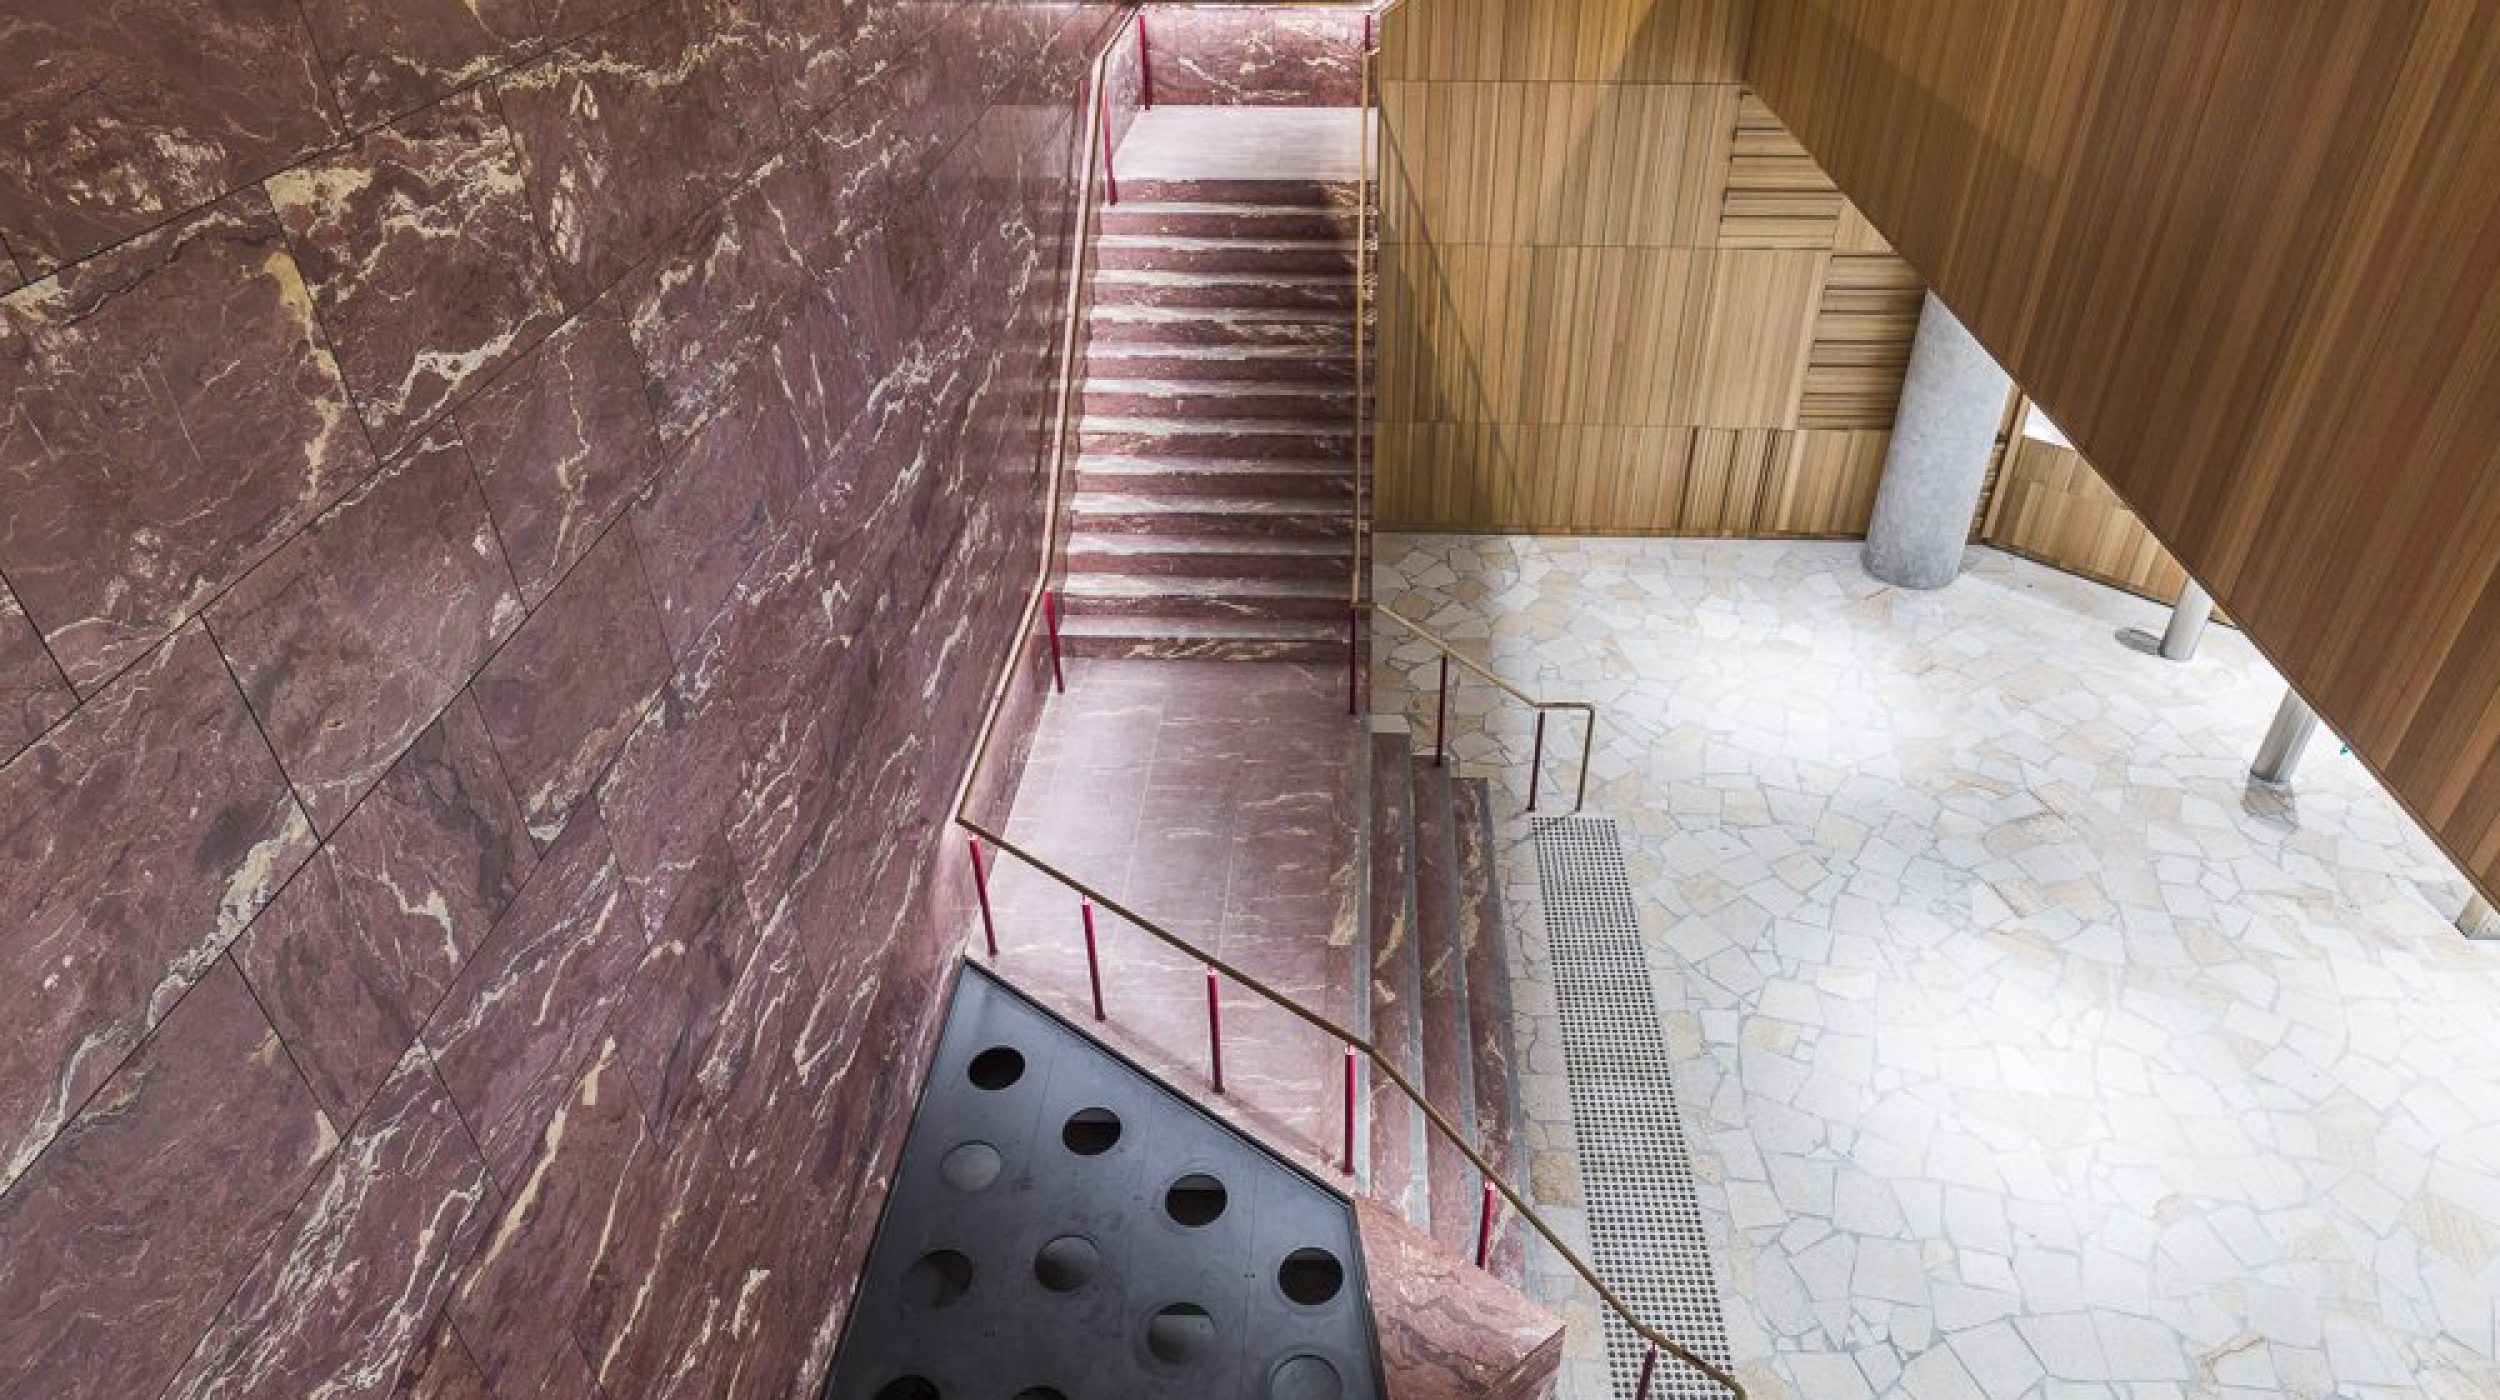 Inter-Tenancy Stairs | SHOR | Active Metal 03